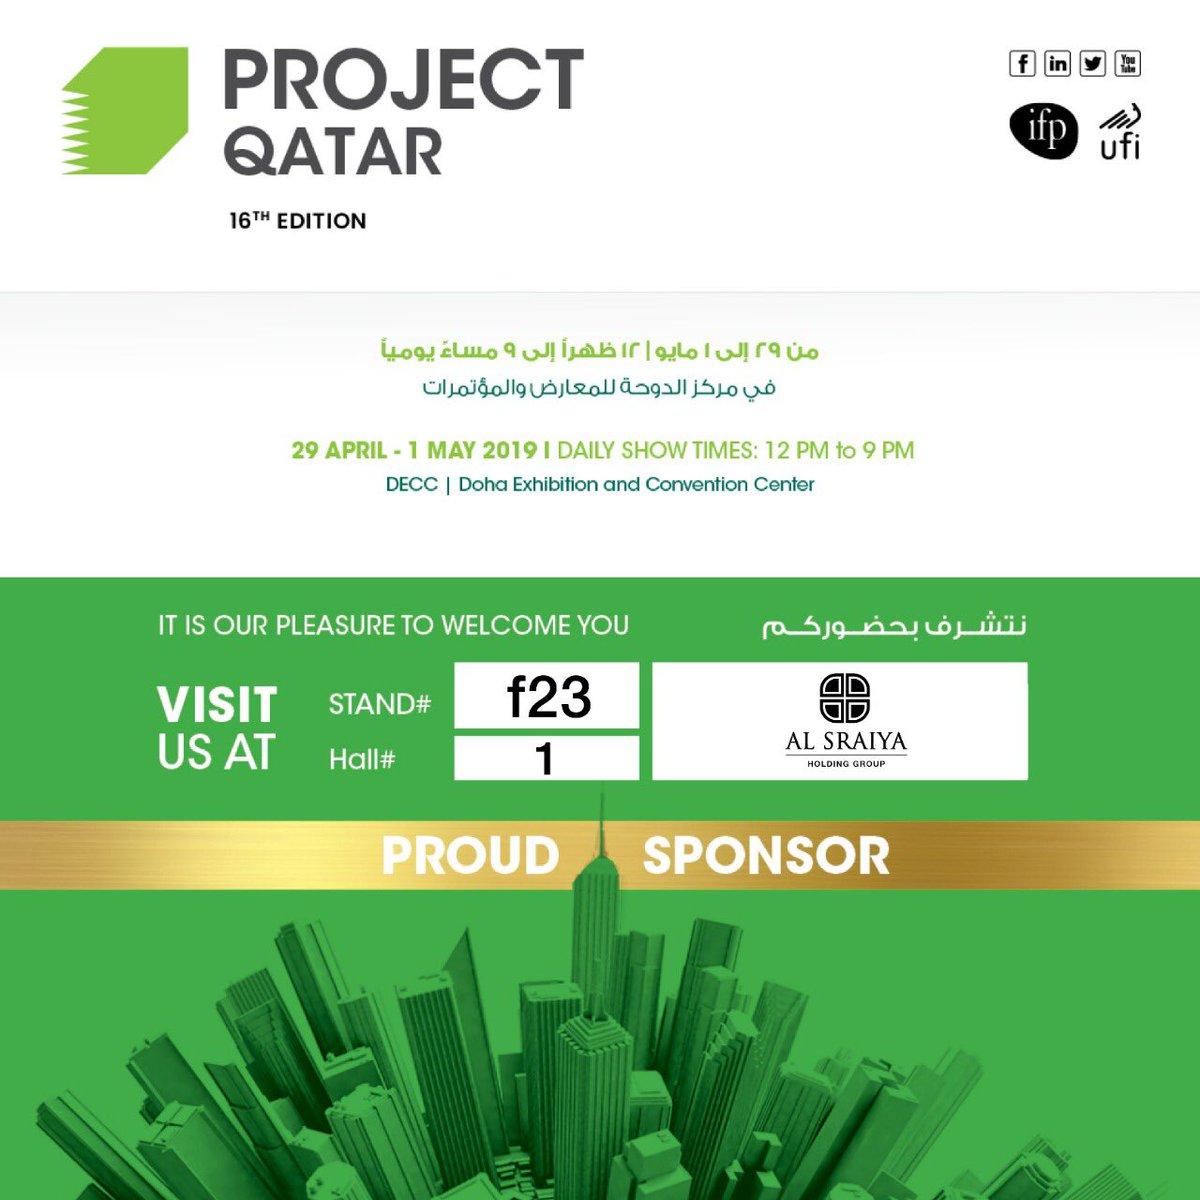 ProjectQatar2019 hashtag on Twitter